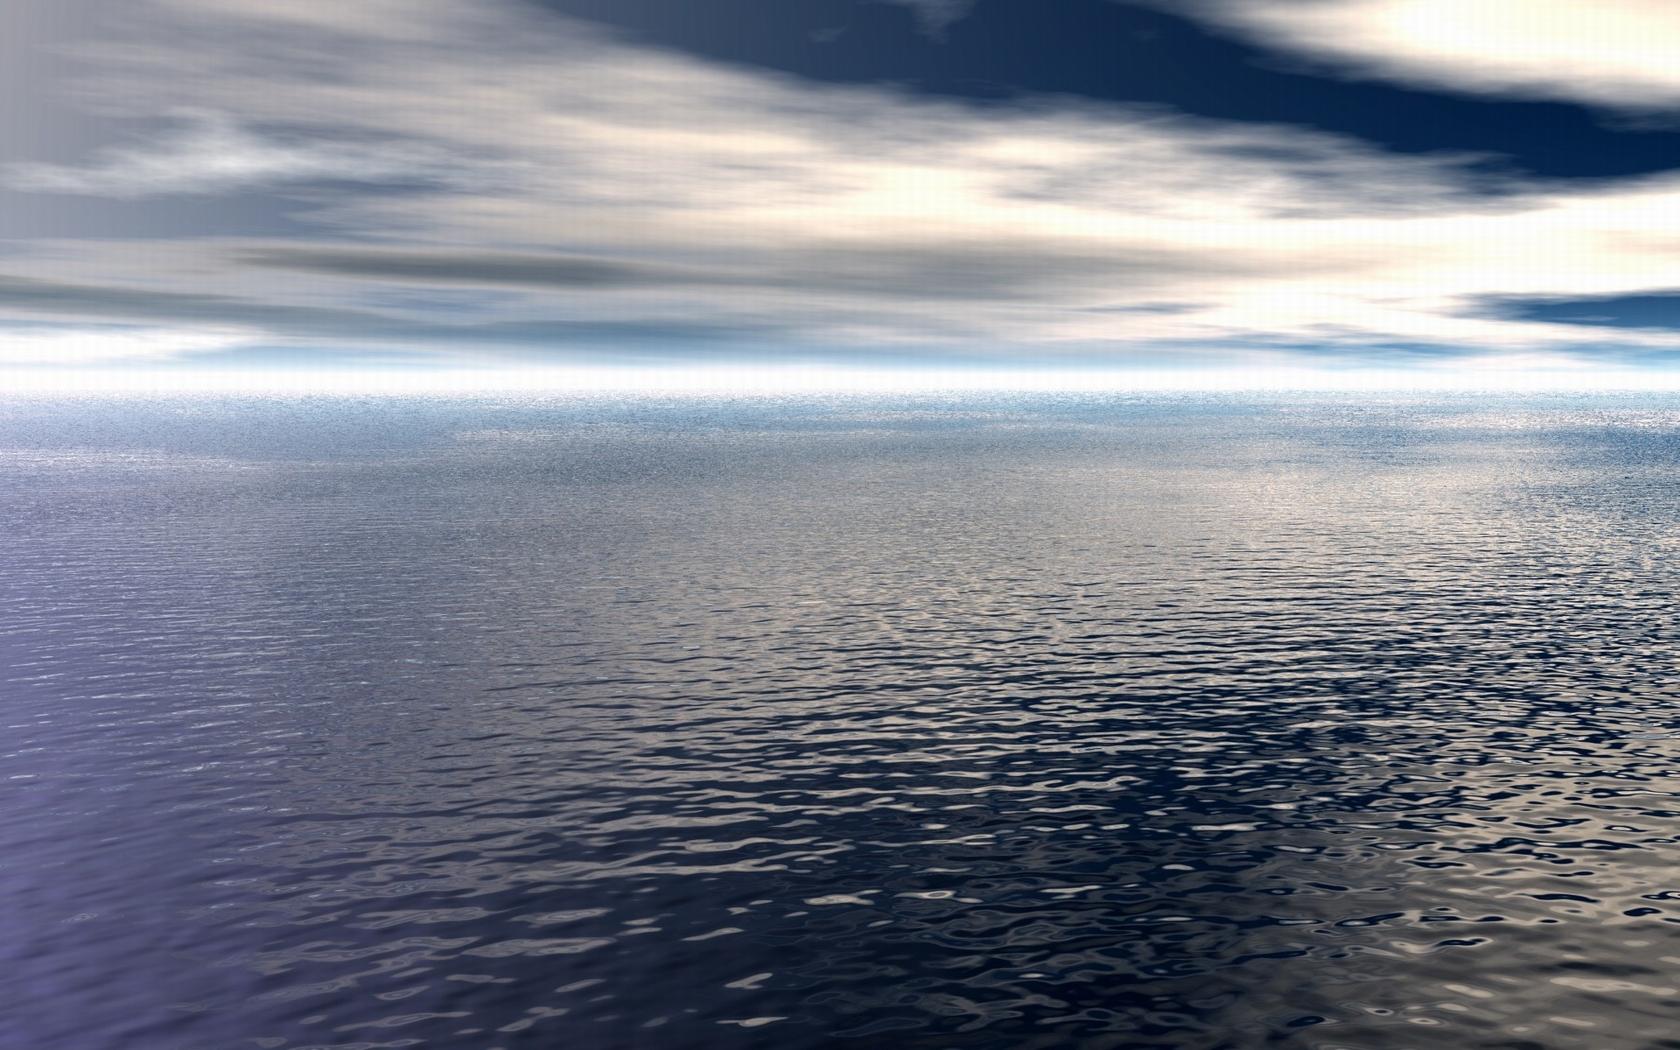 Ocean 3D wallpapers Ocean 3D stock photos 1680x1050